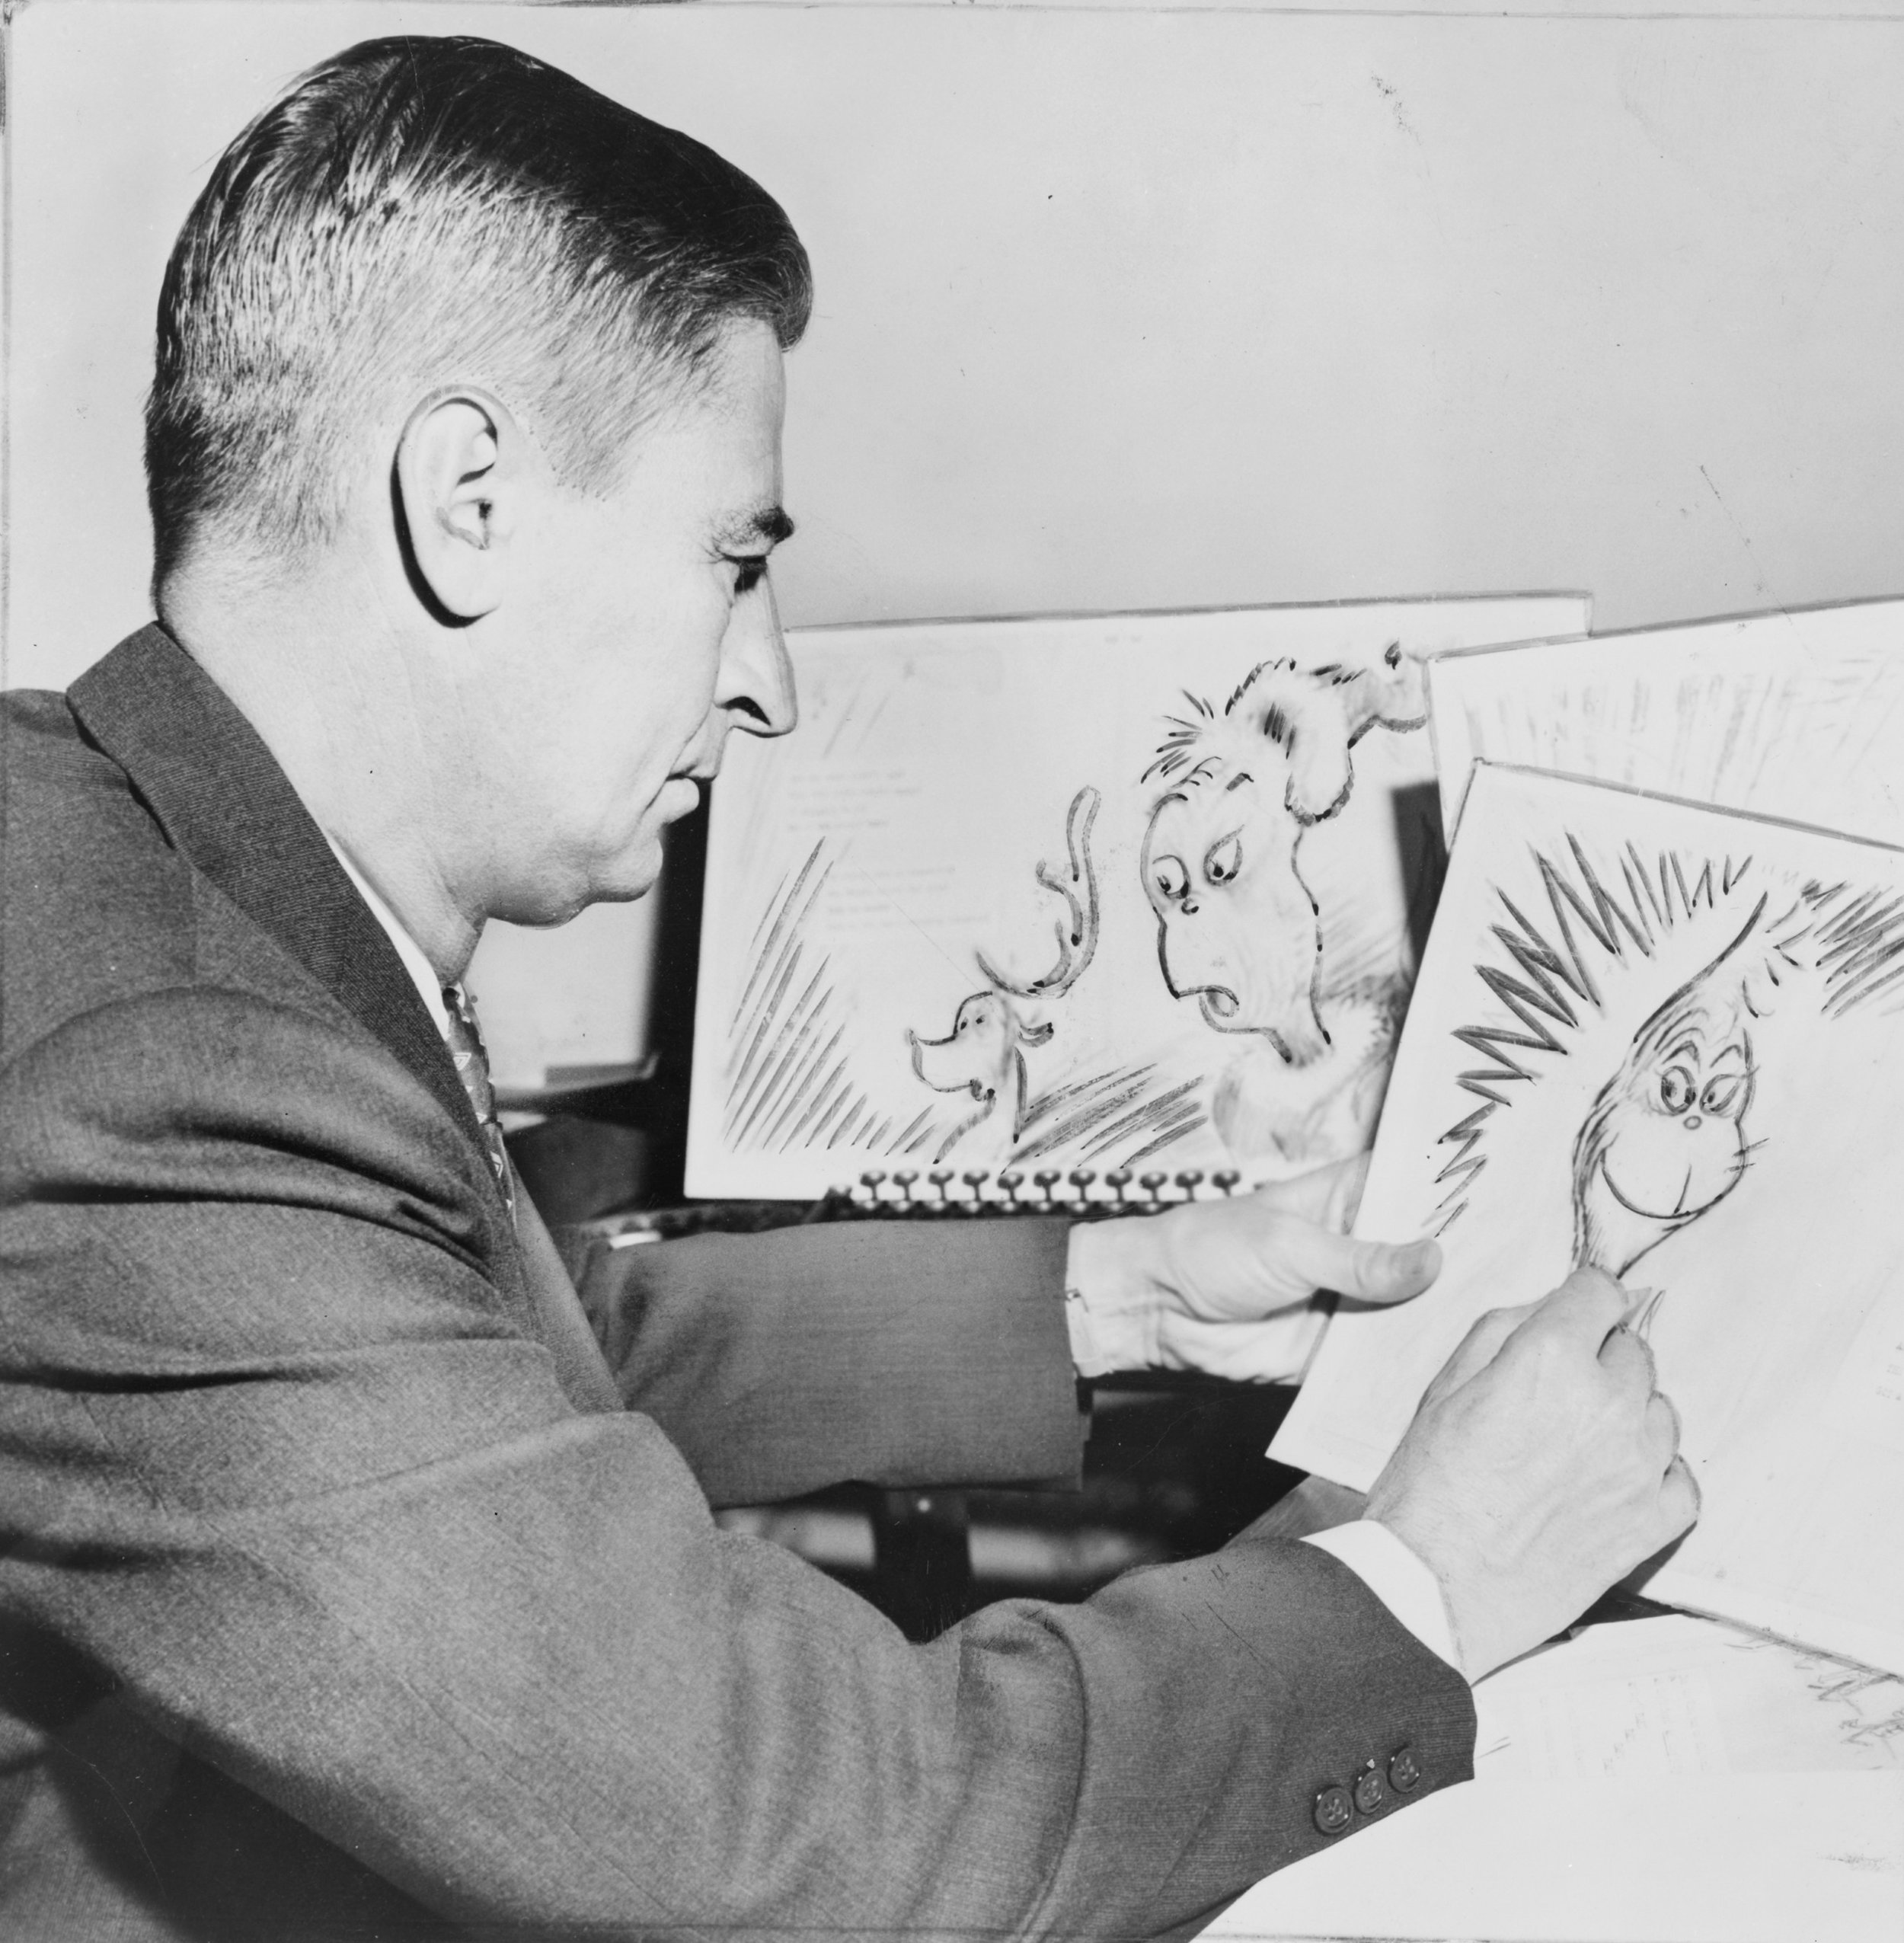 Ted 'Dr. Seuss' Geisel